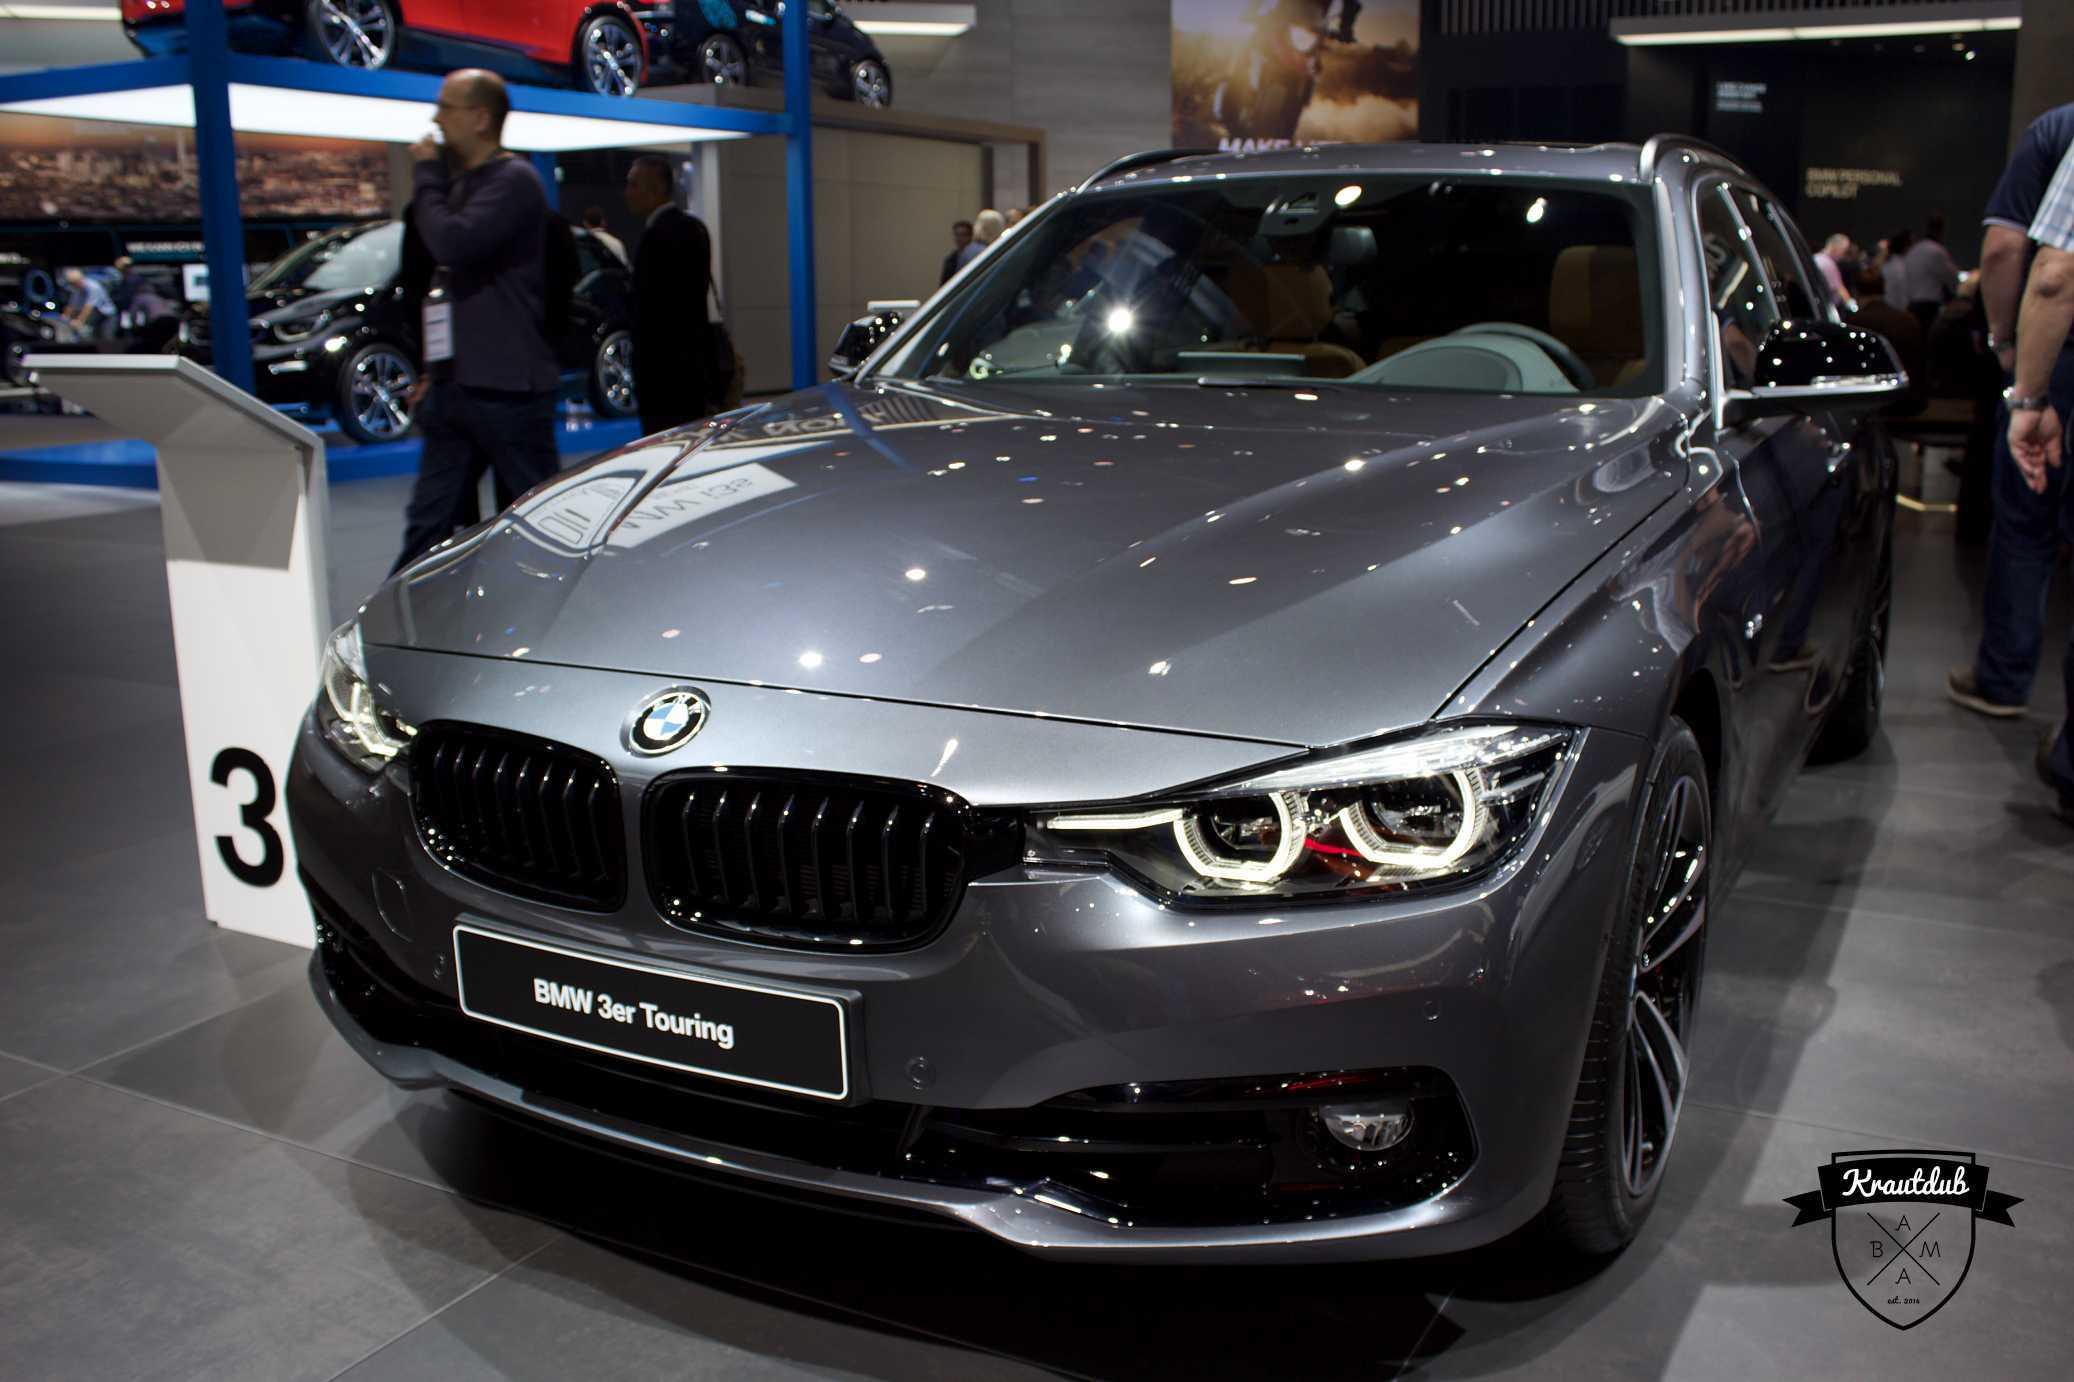 BMW 3er Touring - IAA 2017